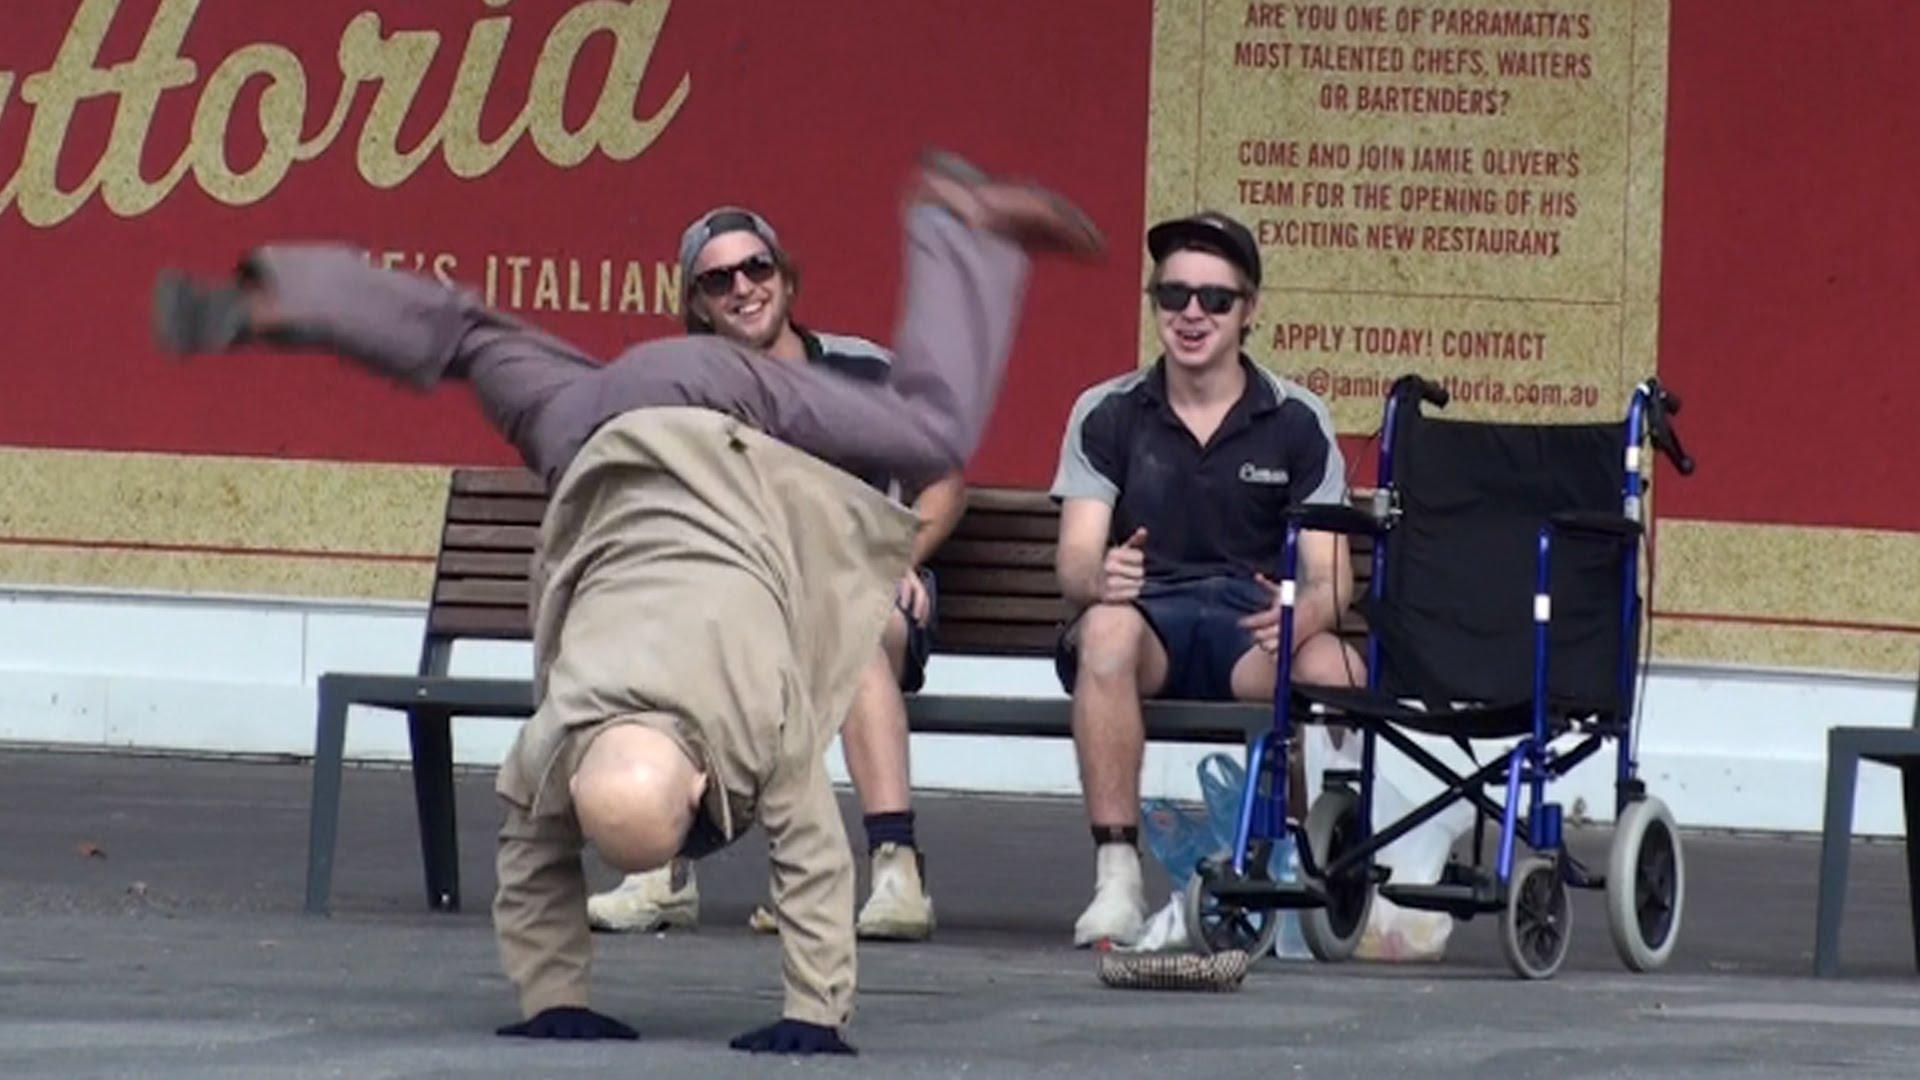 عجوز متنكر يقوم بحركات رقص مدهشة